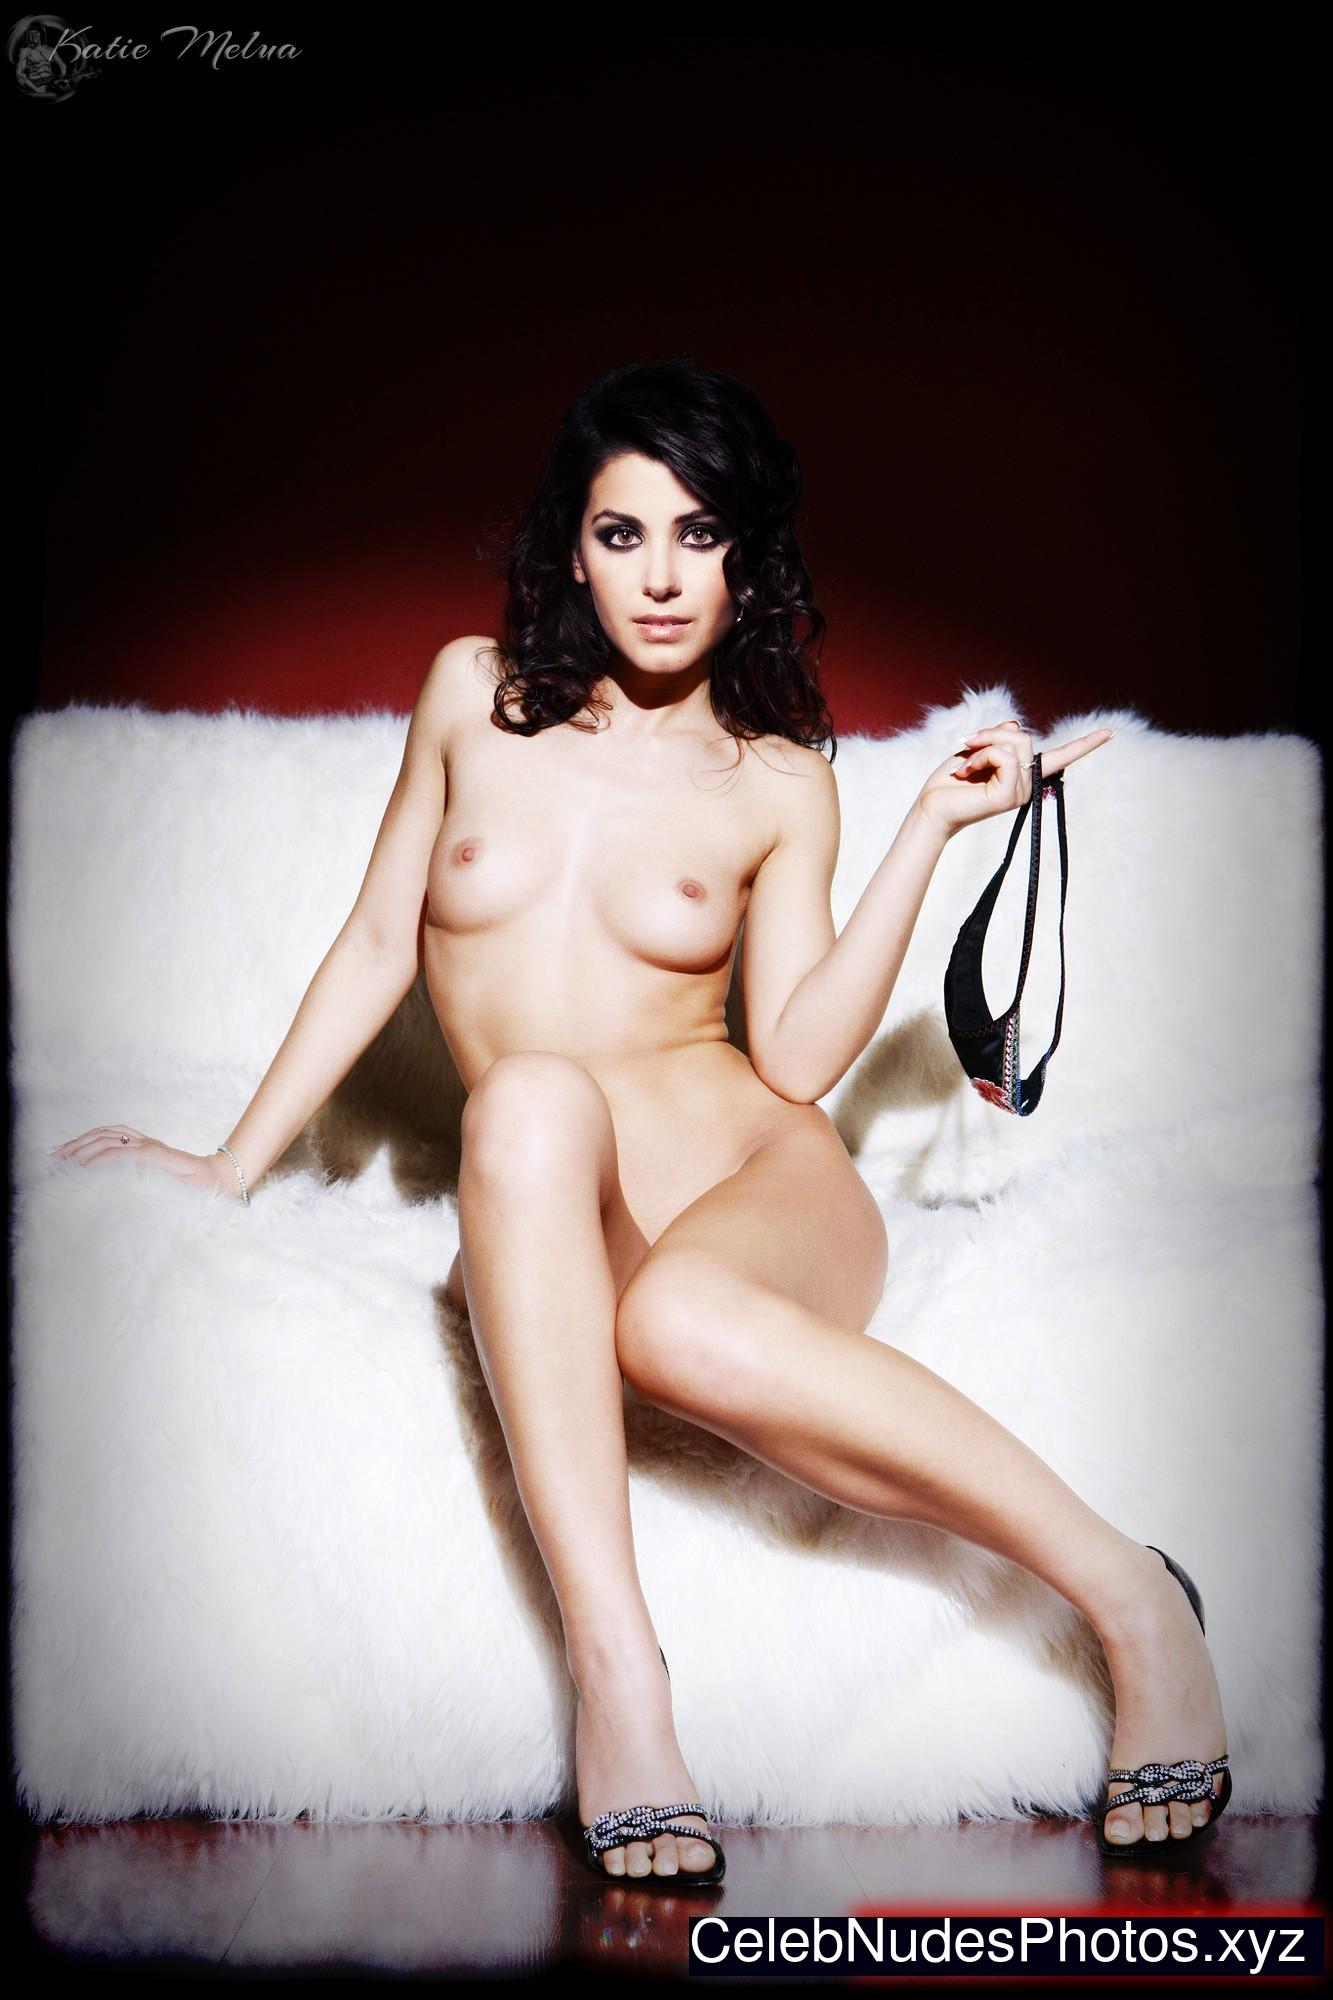 Katie Melua naked celebrities